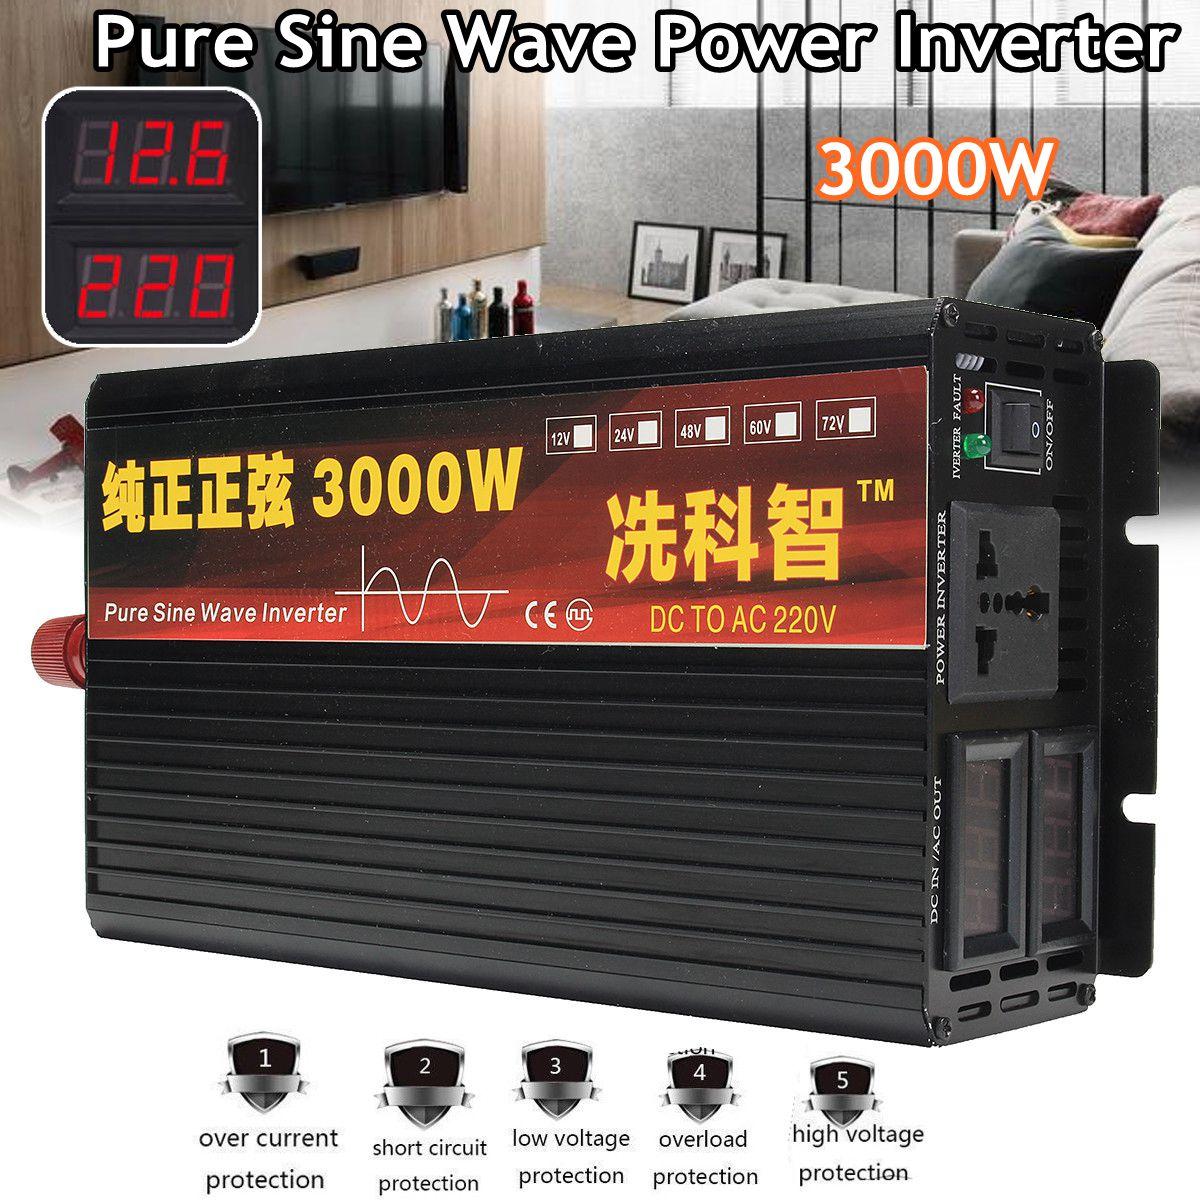 Inverter 12 V/24 V 220V 2000/3000/4000W Transformator Gelombang Sinus Murni inverter DC12V untuk AC 220V CONVERTER + 2 LED Display